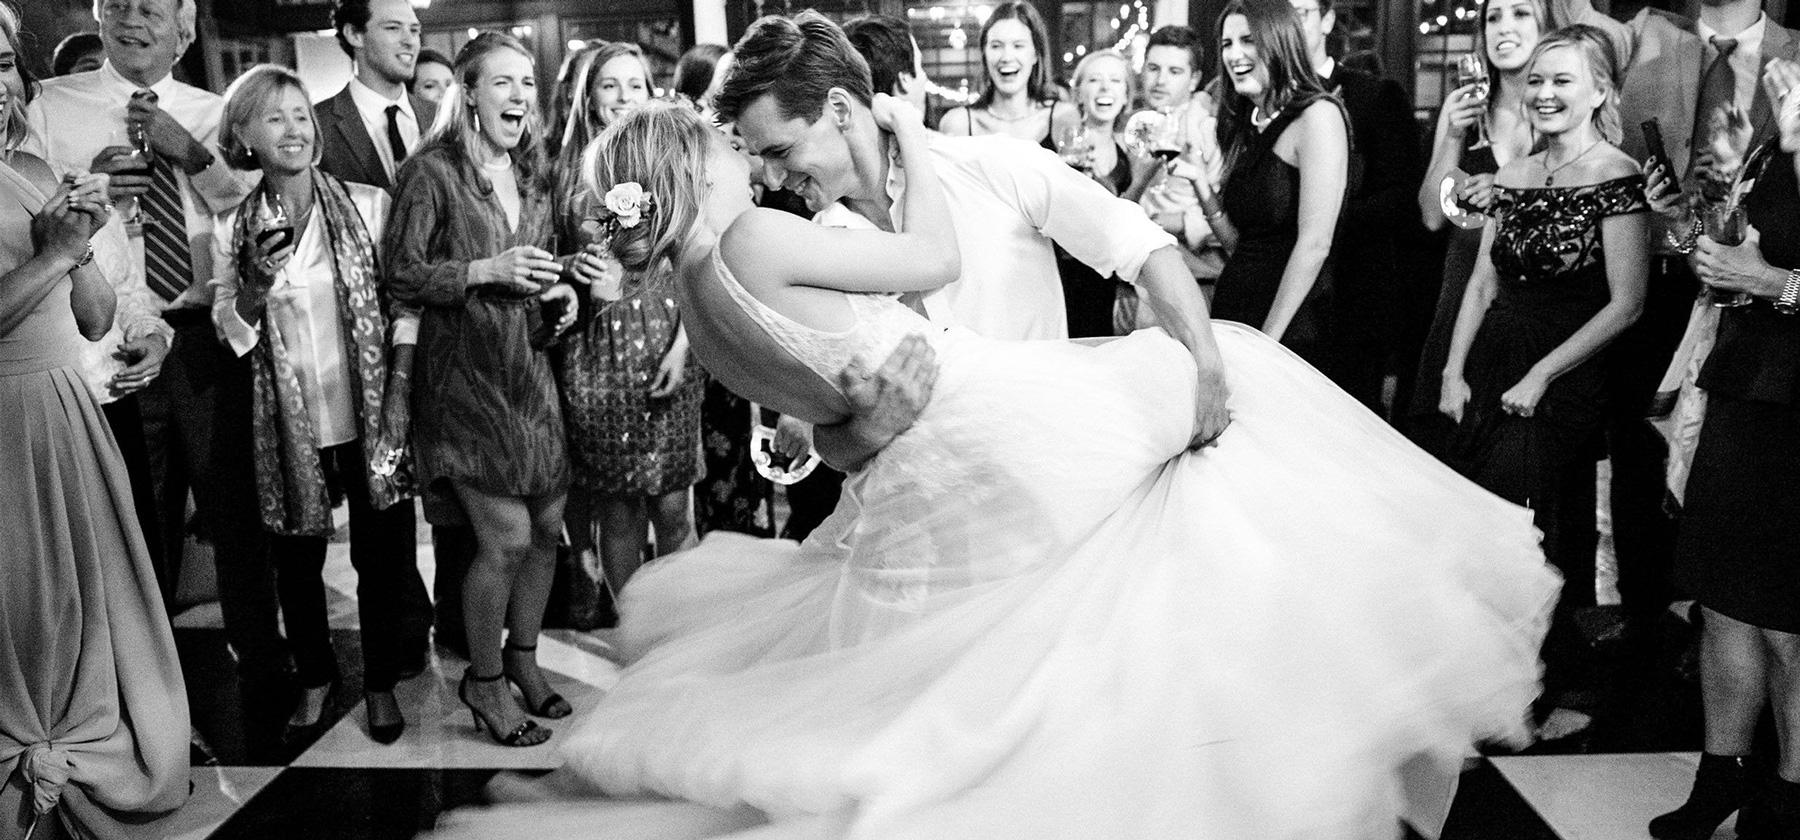 mariee-ami-wedding-planning-advice.jpg